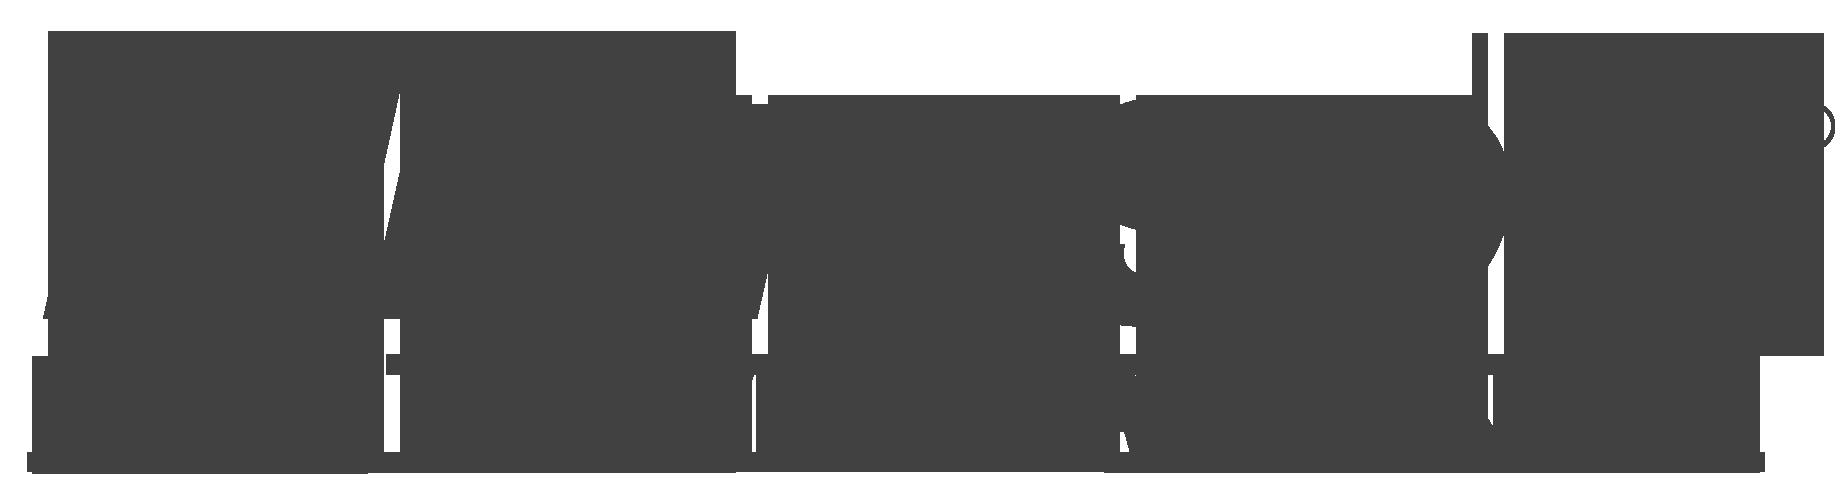 Microsoft Parter Academy